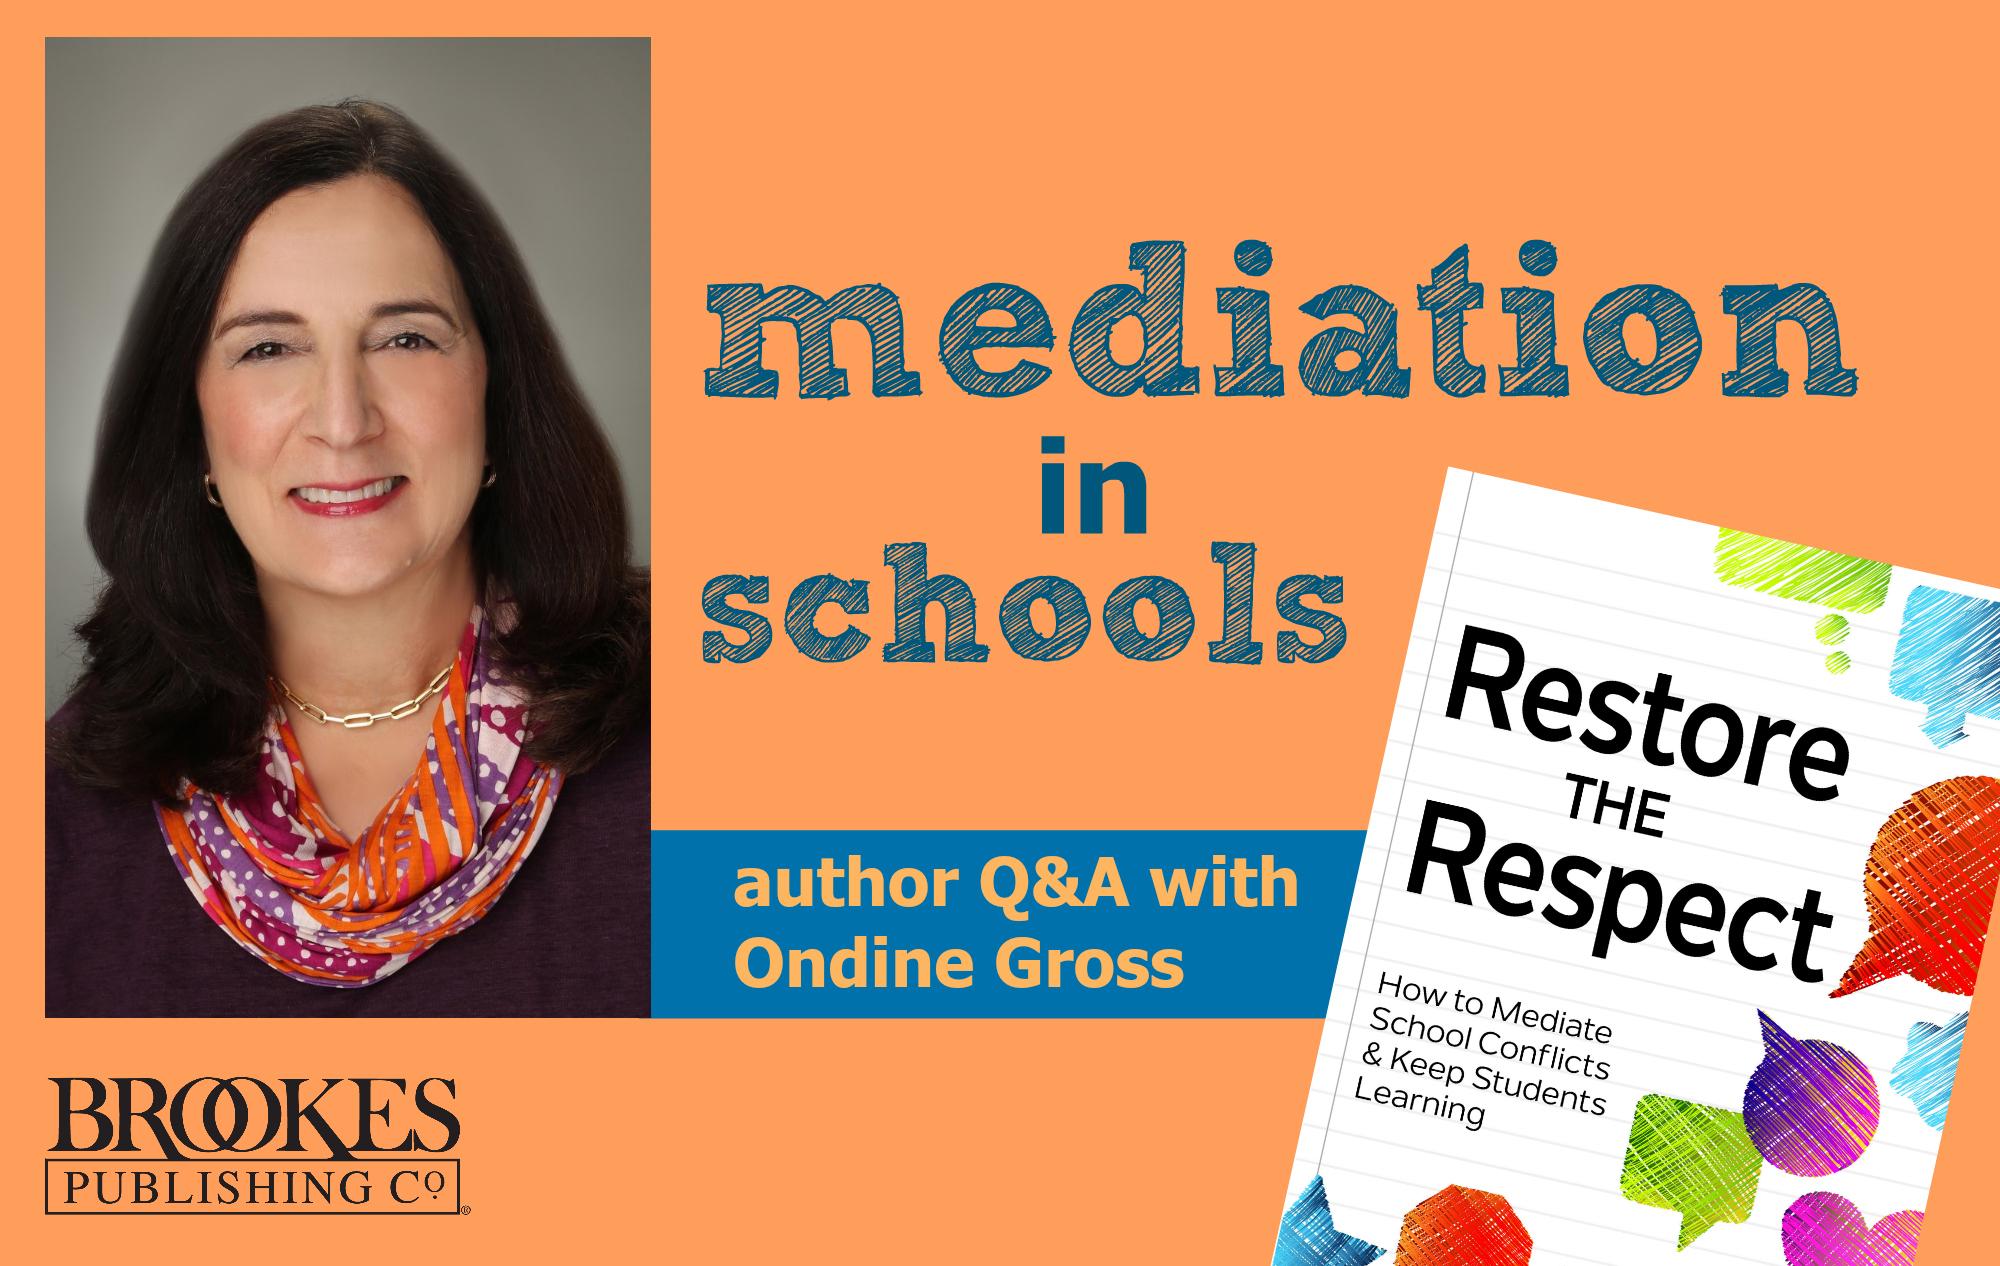 mediation in schools